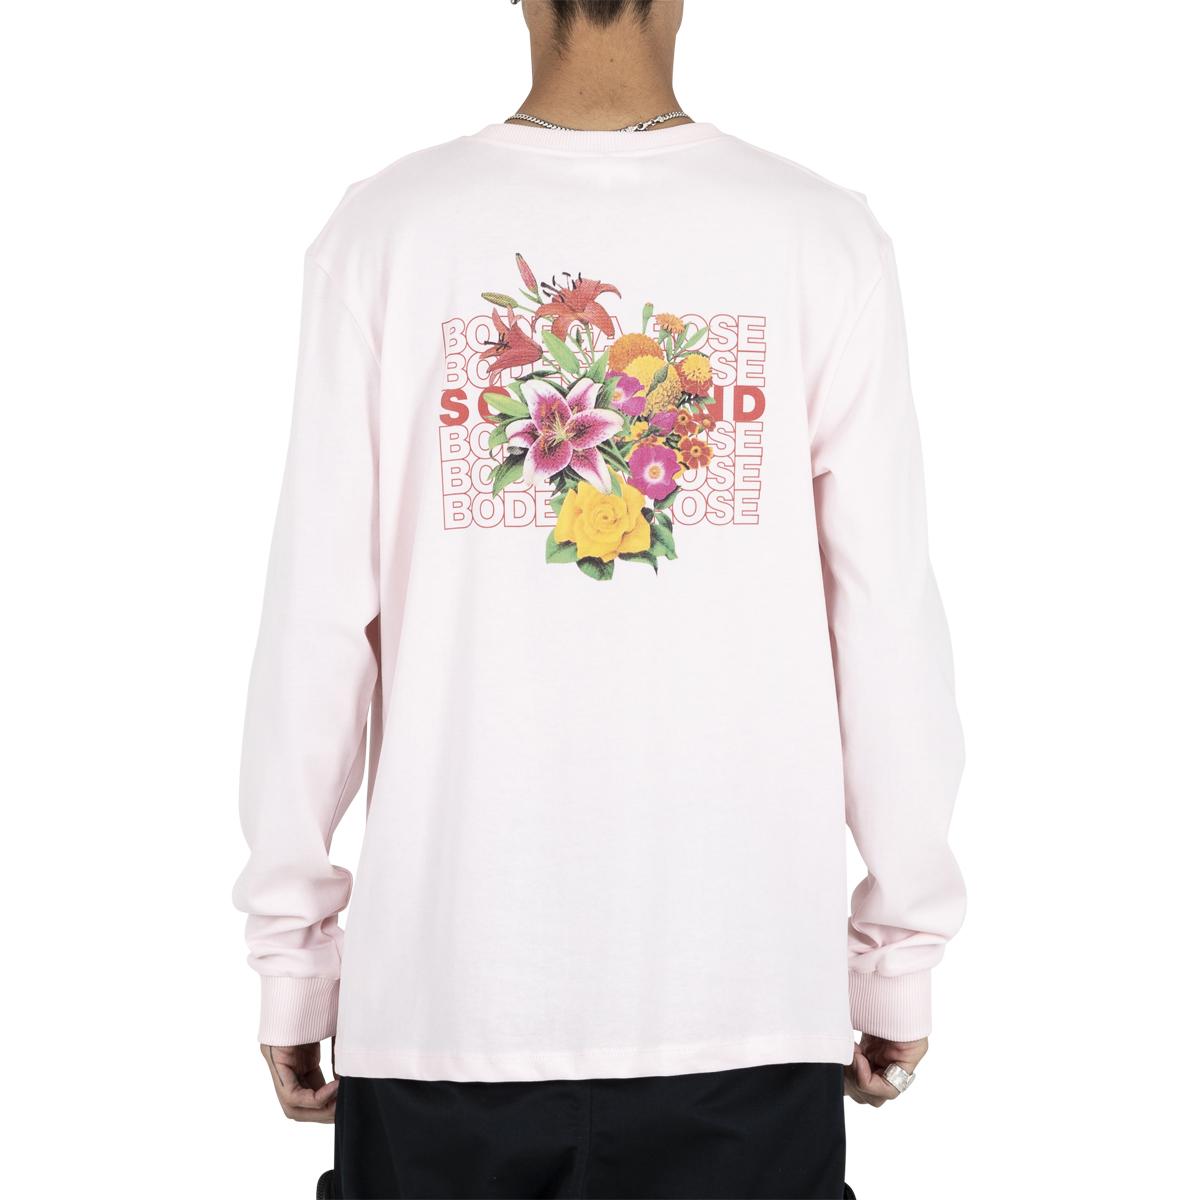 soulland Meets Bodega Rose